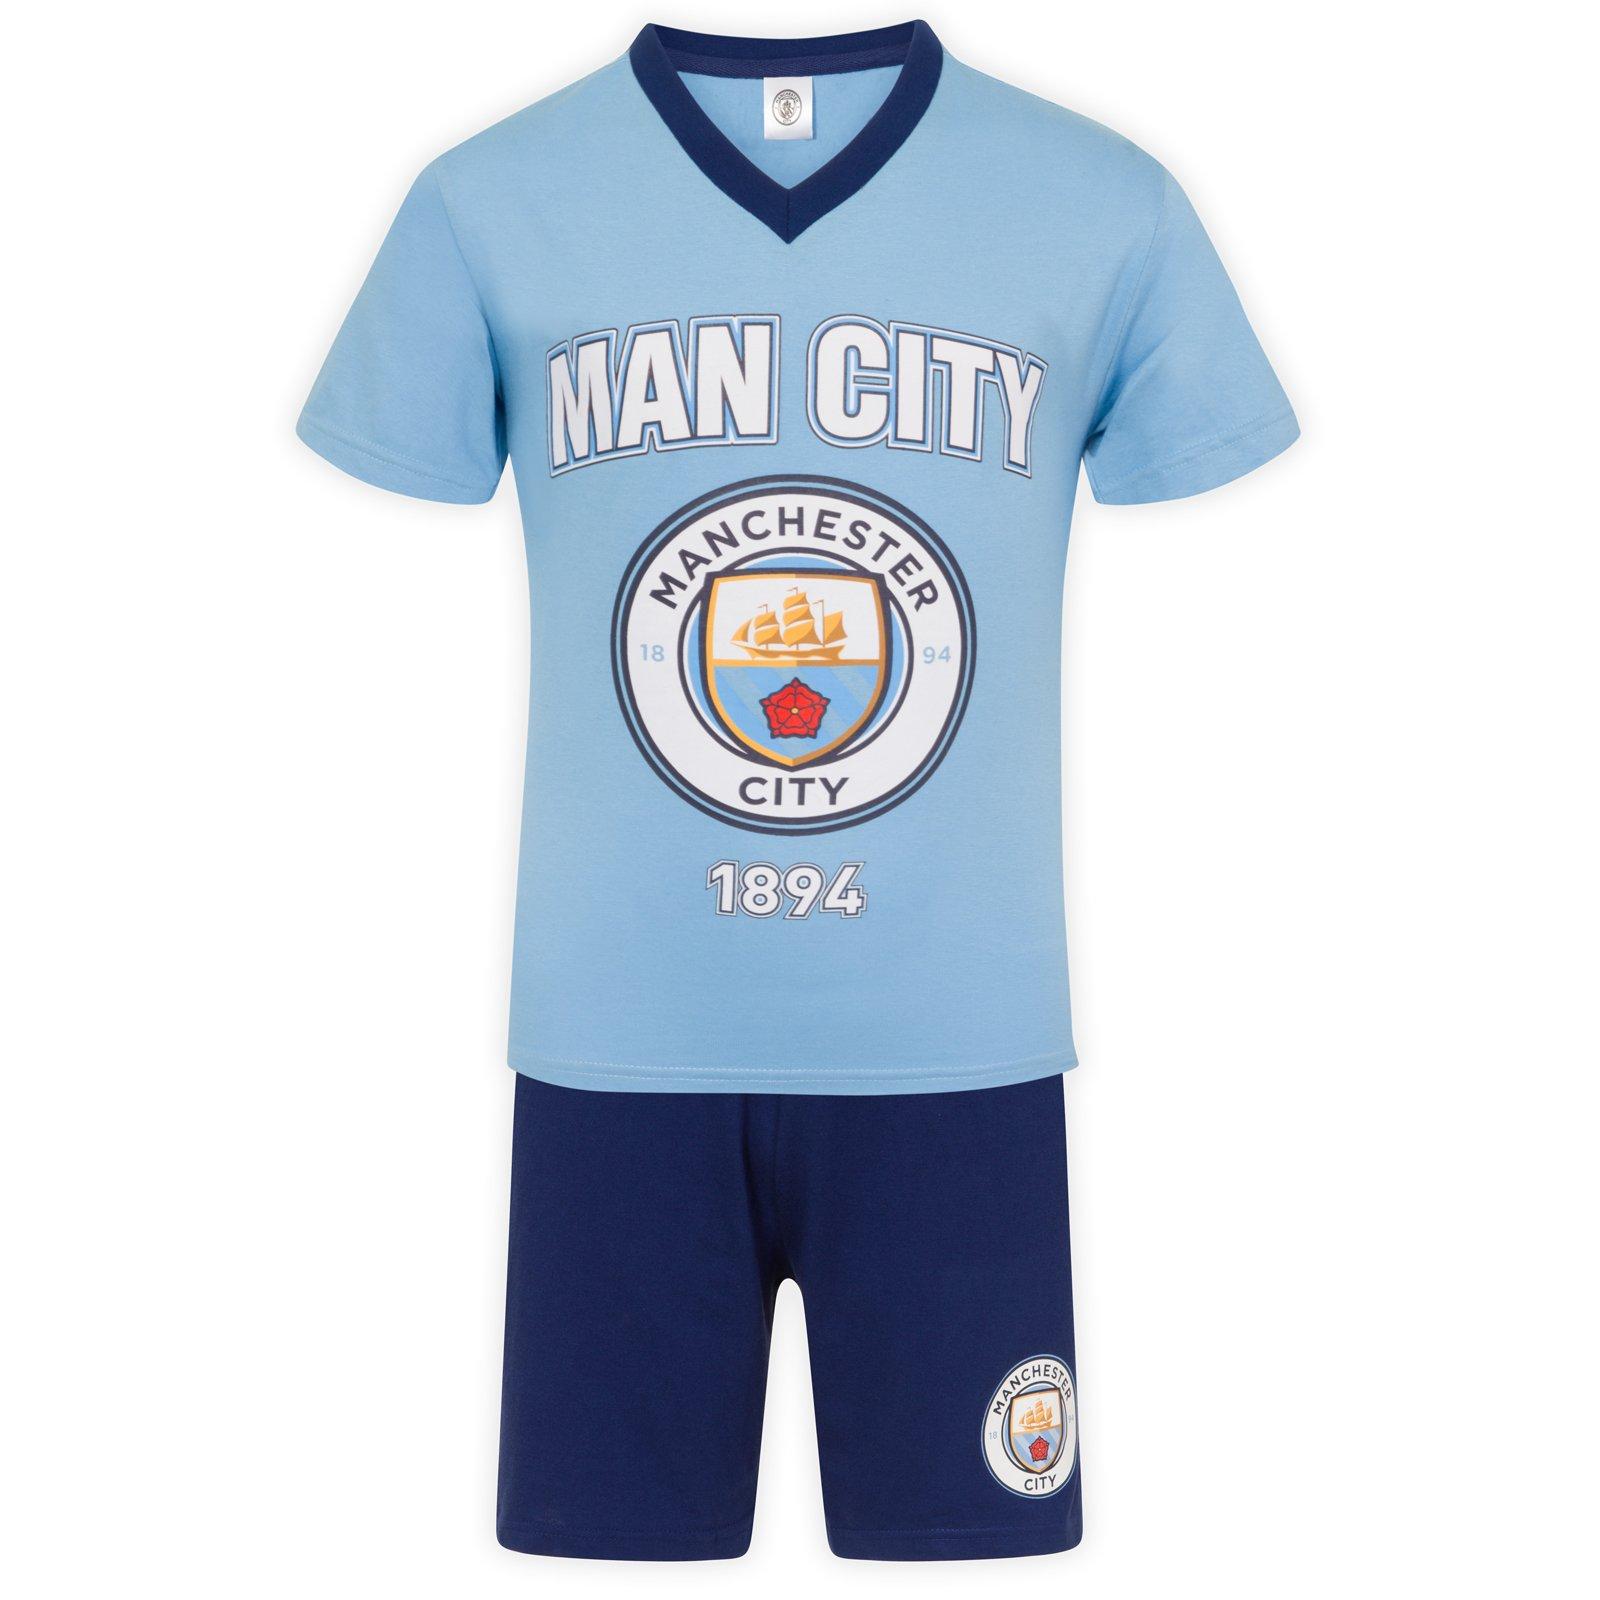 Manchester City FC Official Gift Mens Loungewear Short Pajamas Blue XL